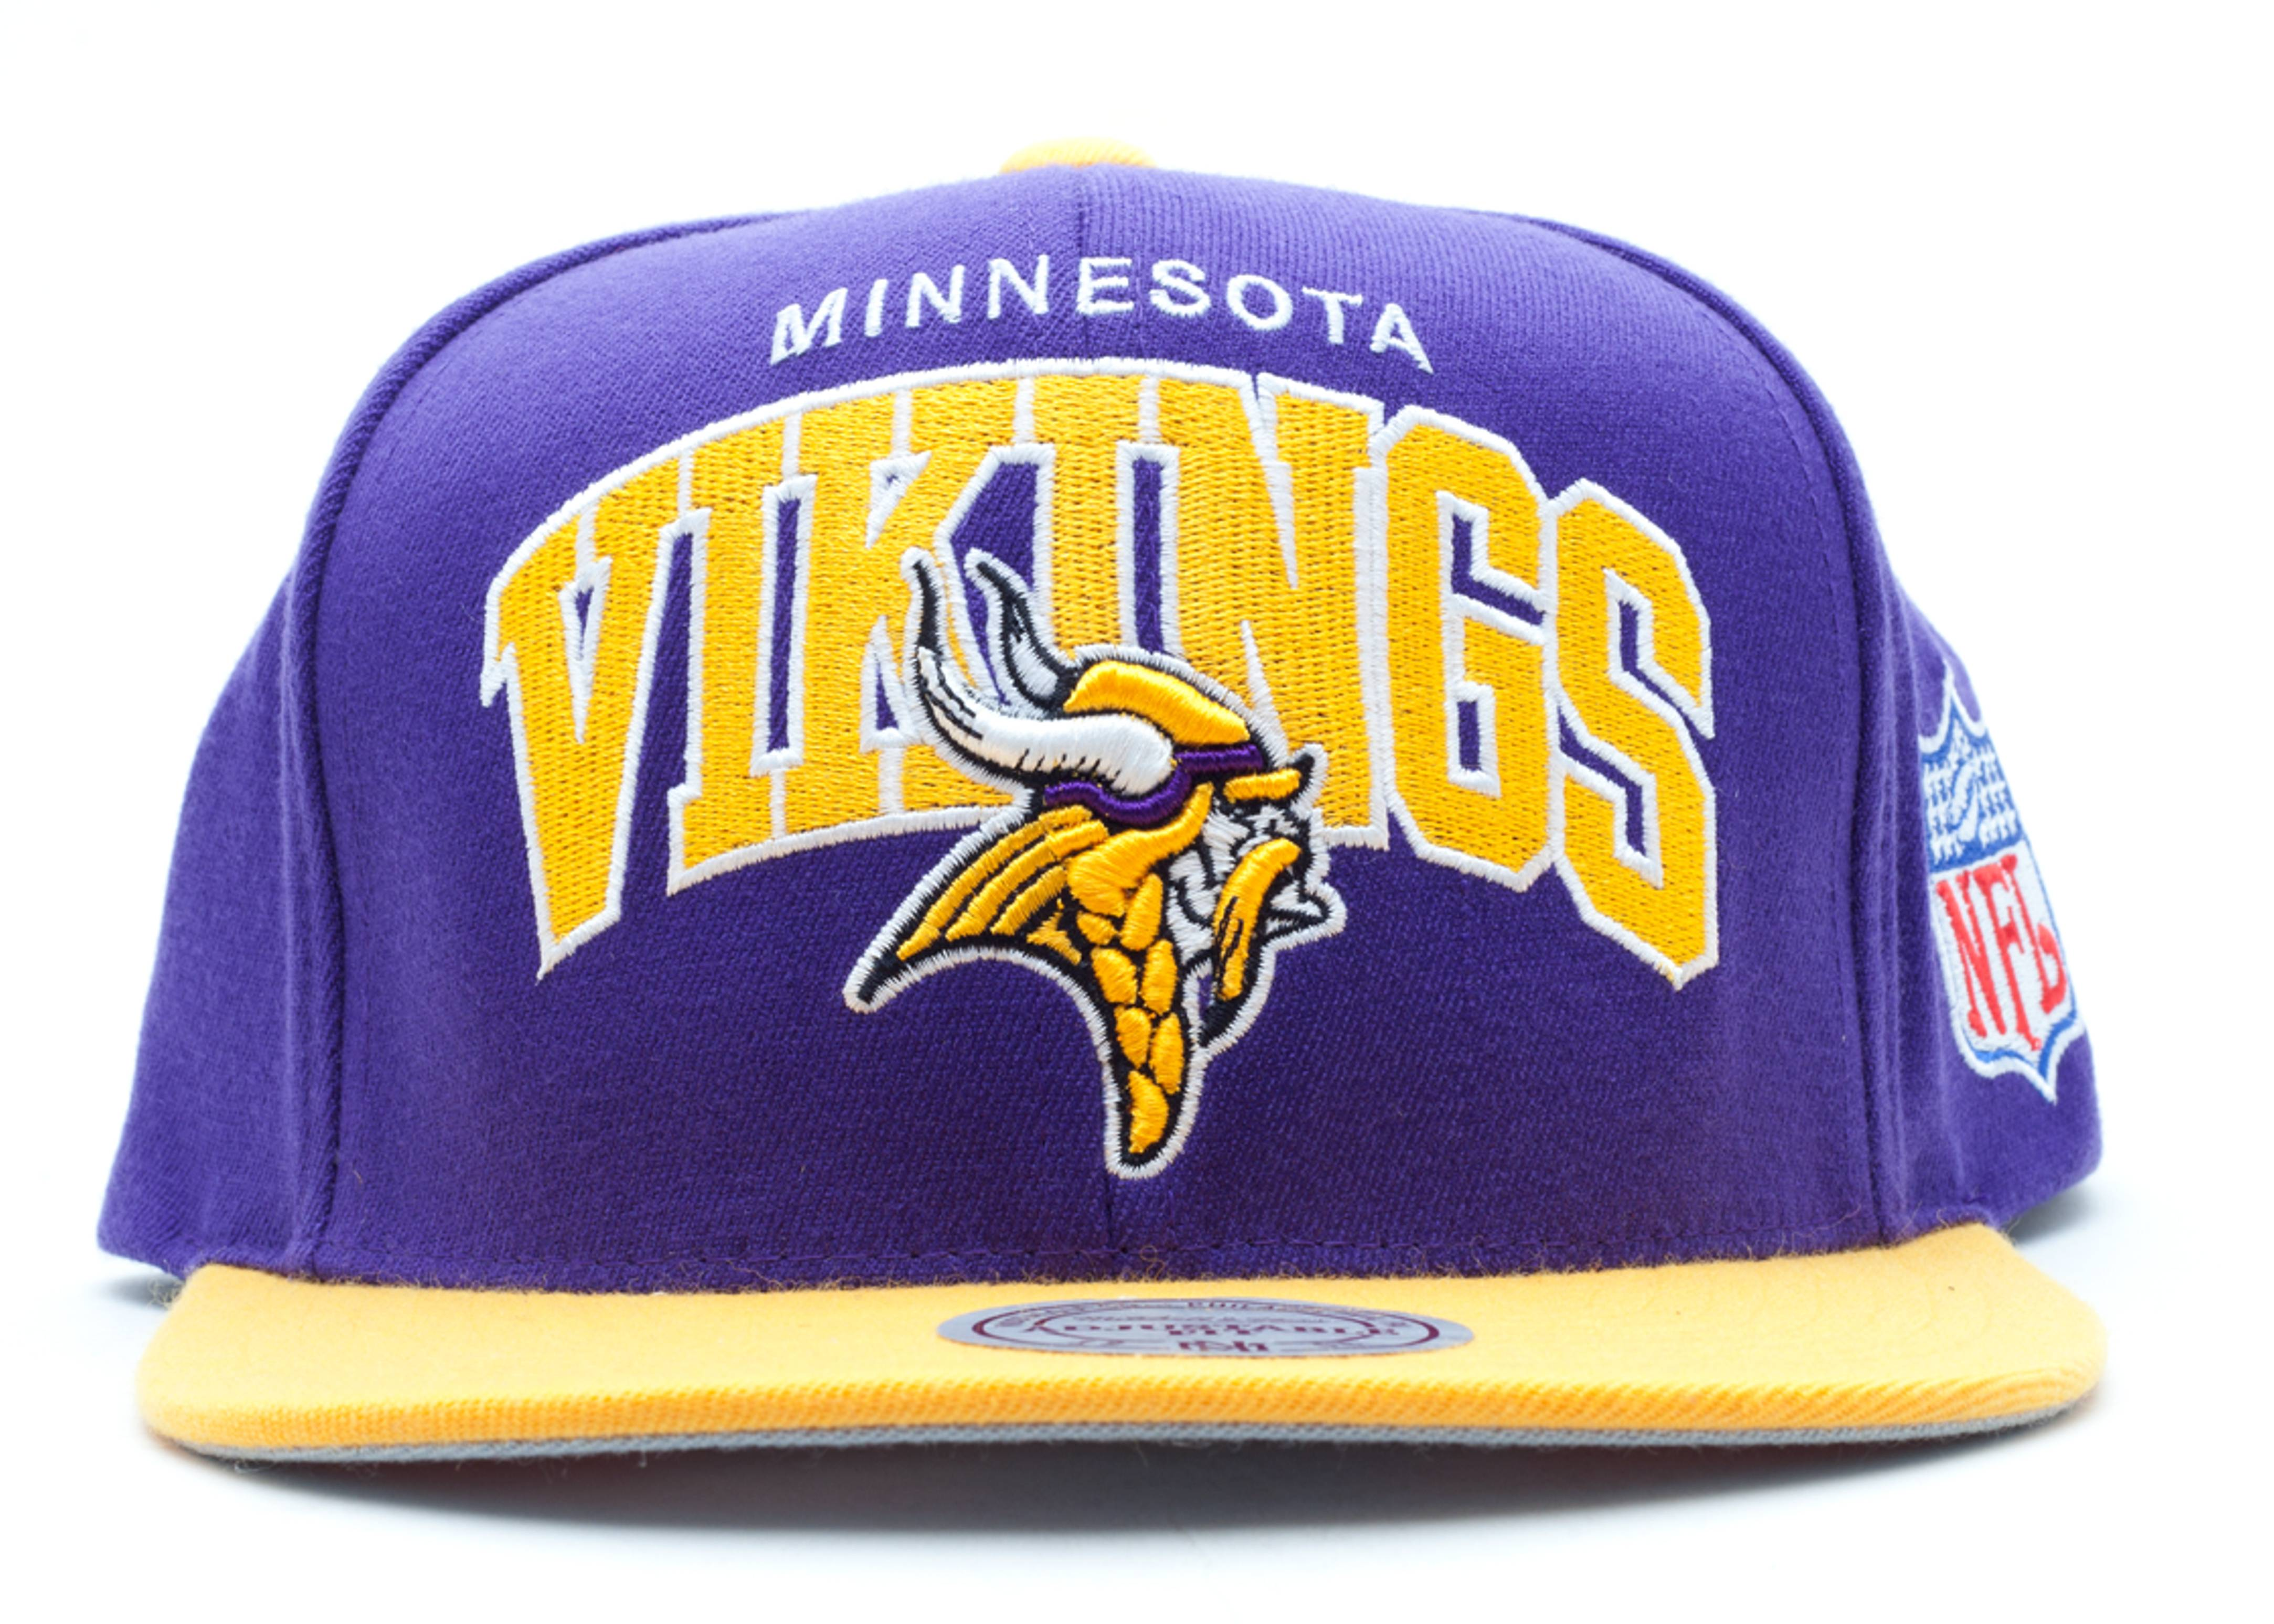 new product 3abd0 a82c1 Minnesota Vikings Snap-back - Mitchell & Ness ...